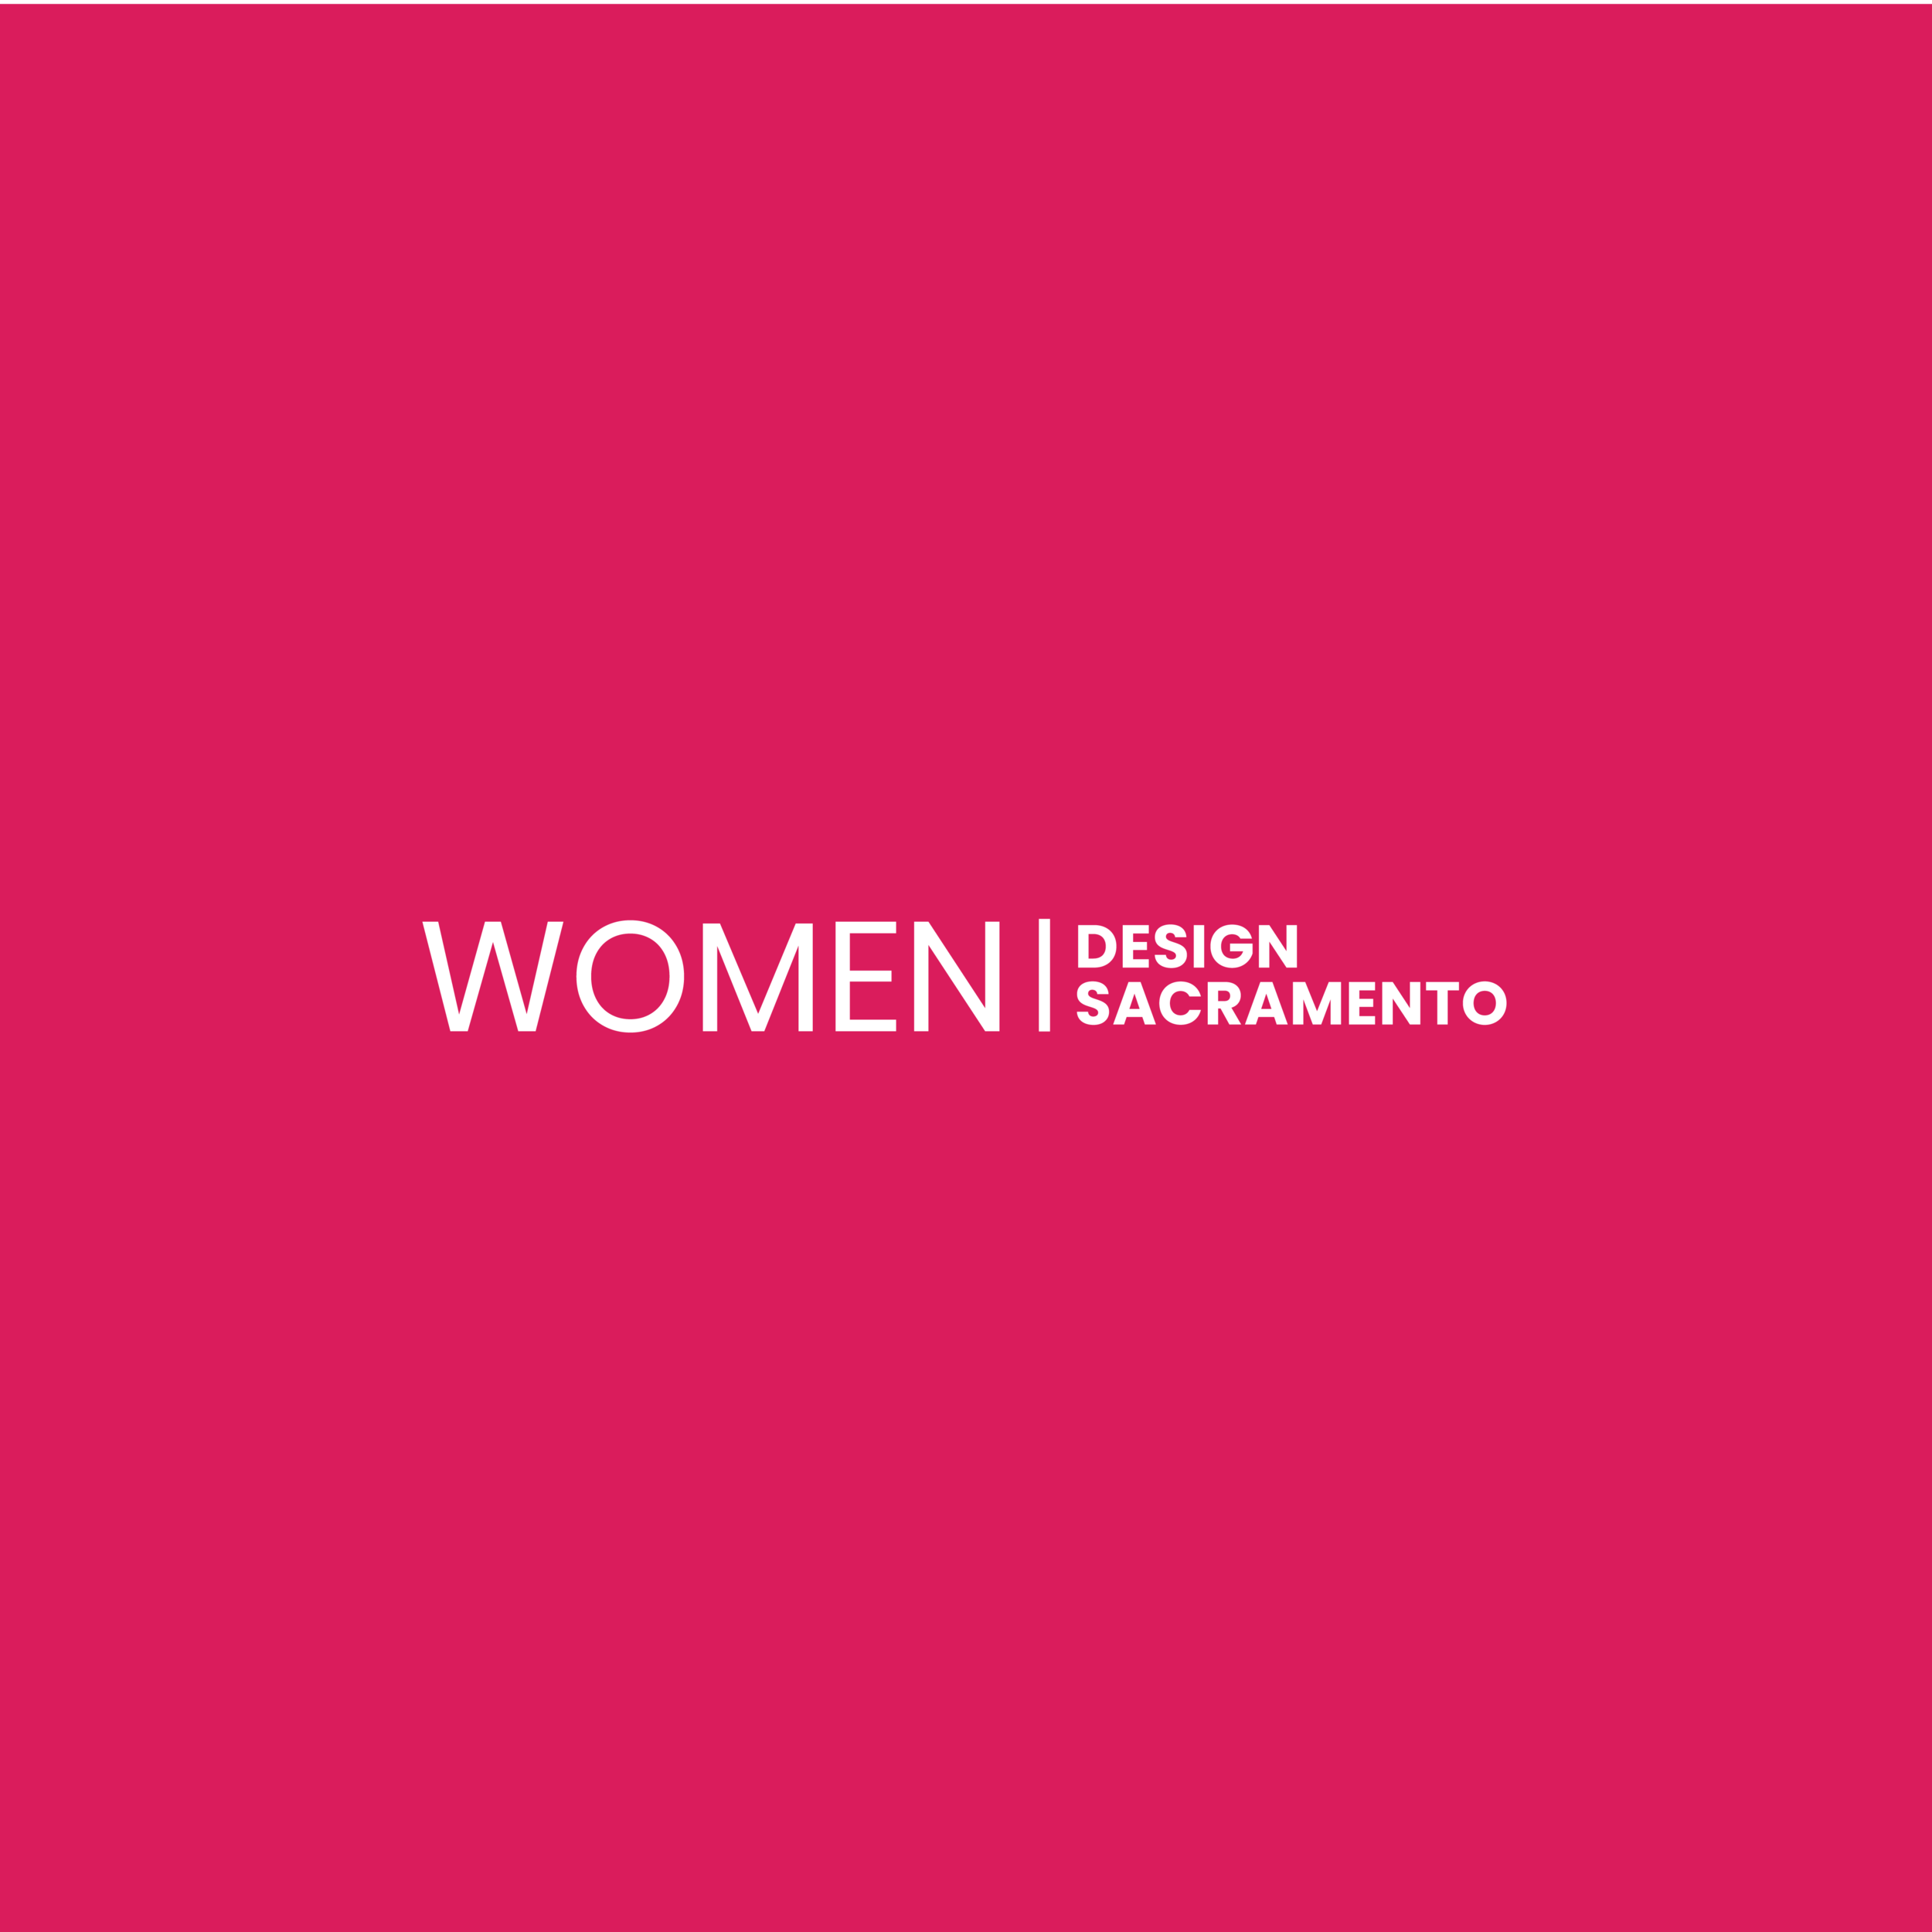 Women Design Sac-Social-ColorBG-01.png